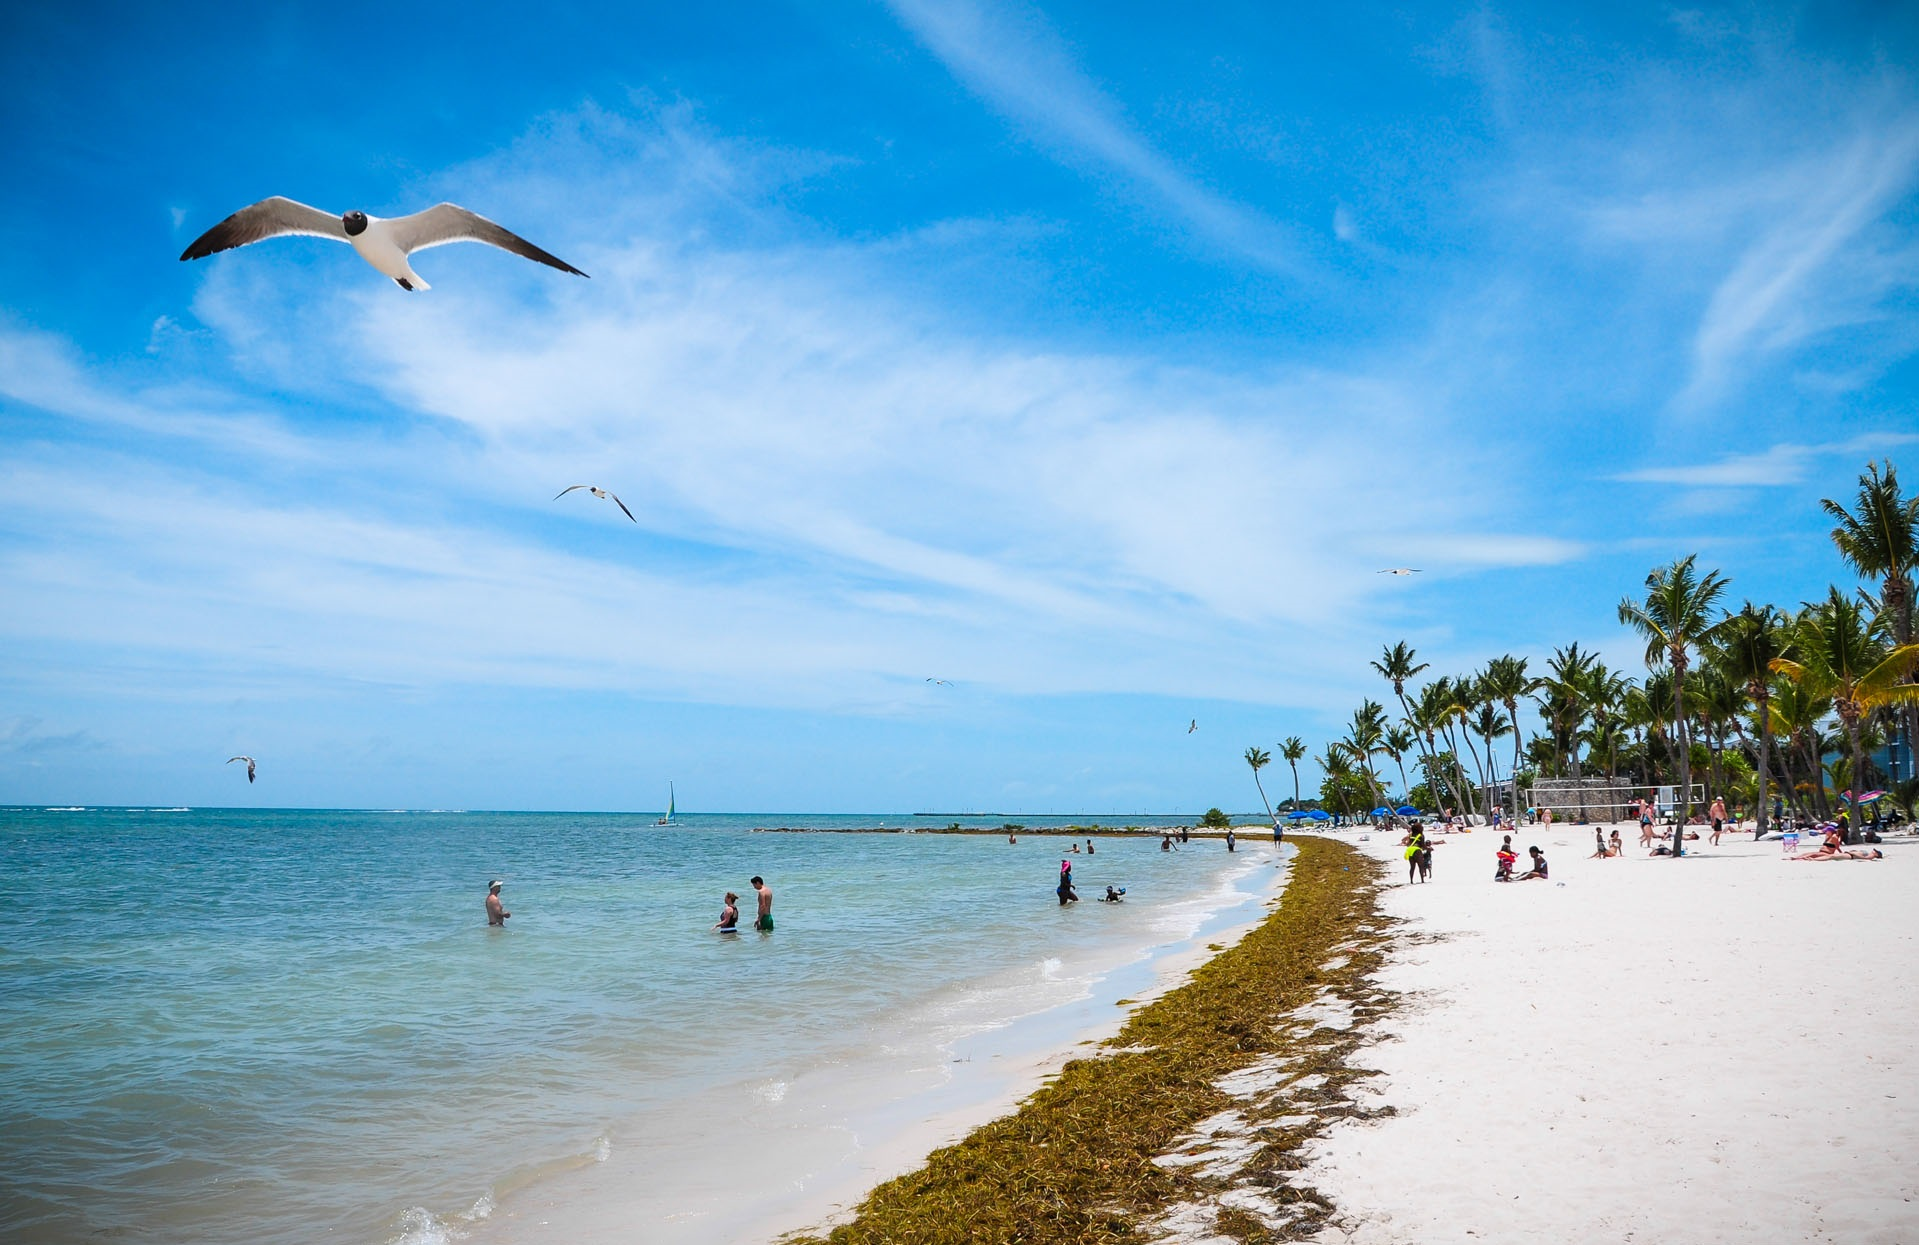 Hotels on Beach in Key West